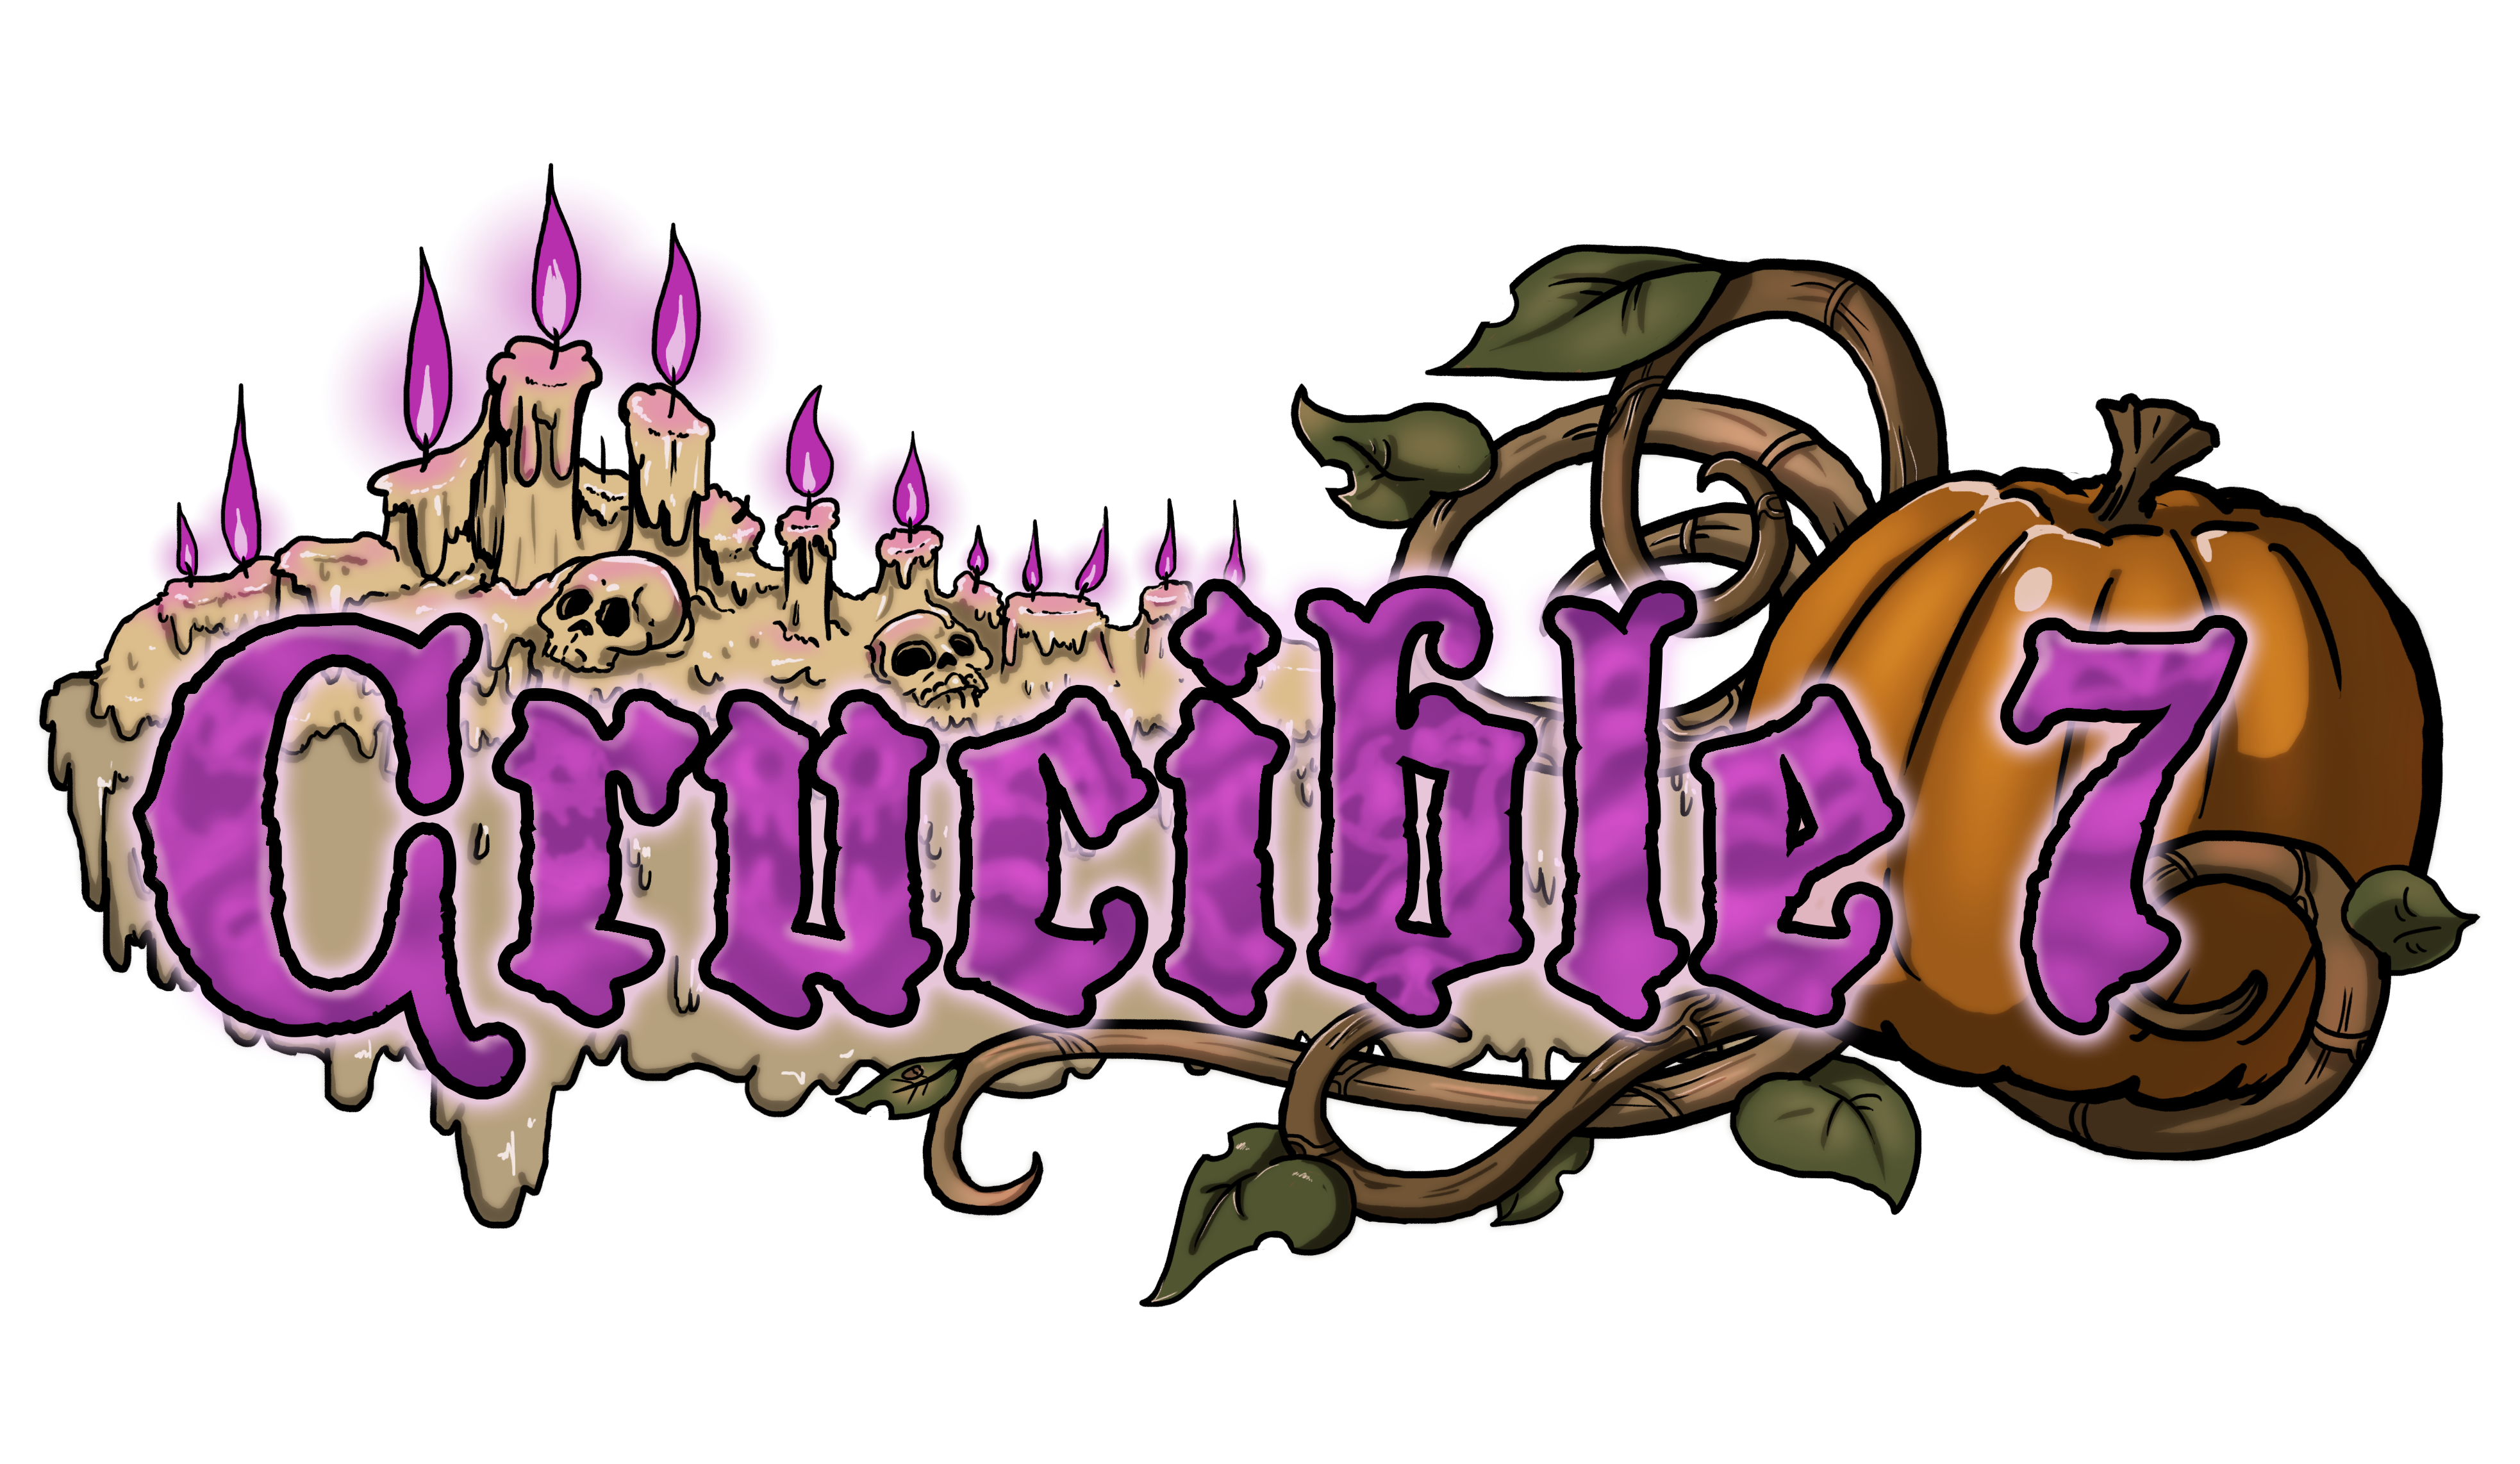 Crucible 7